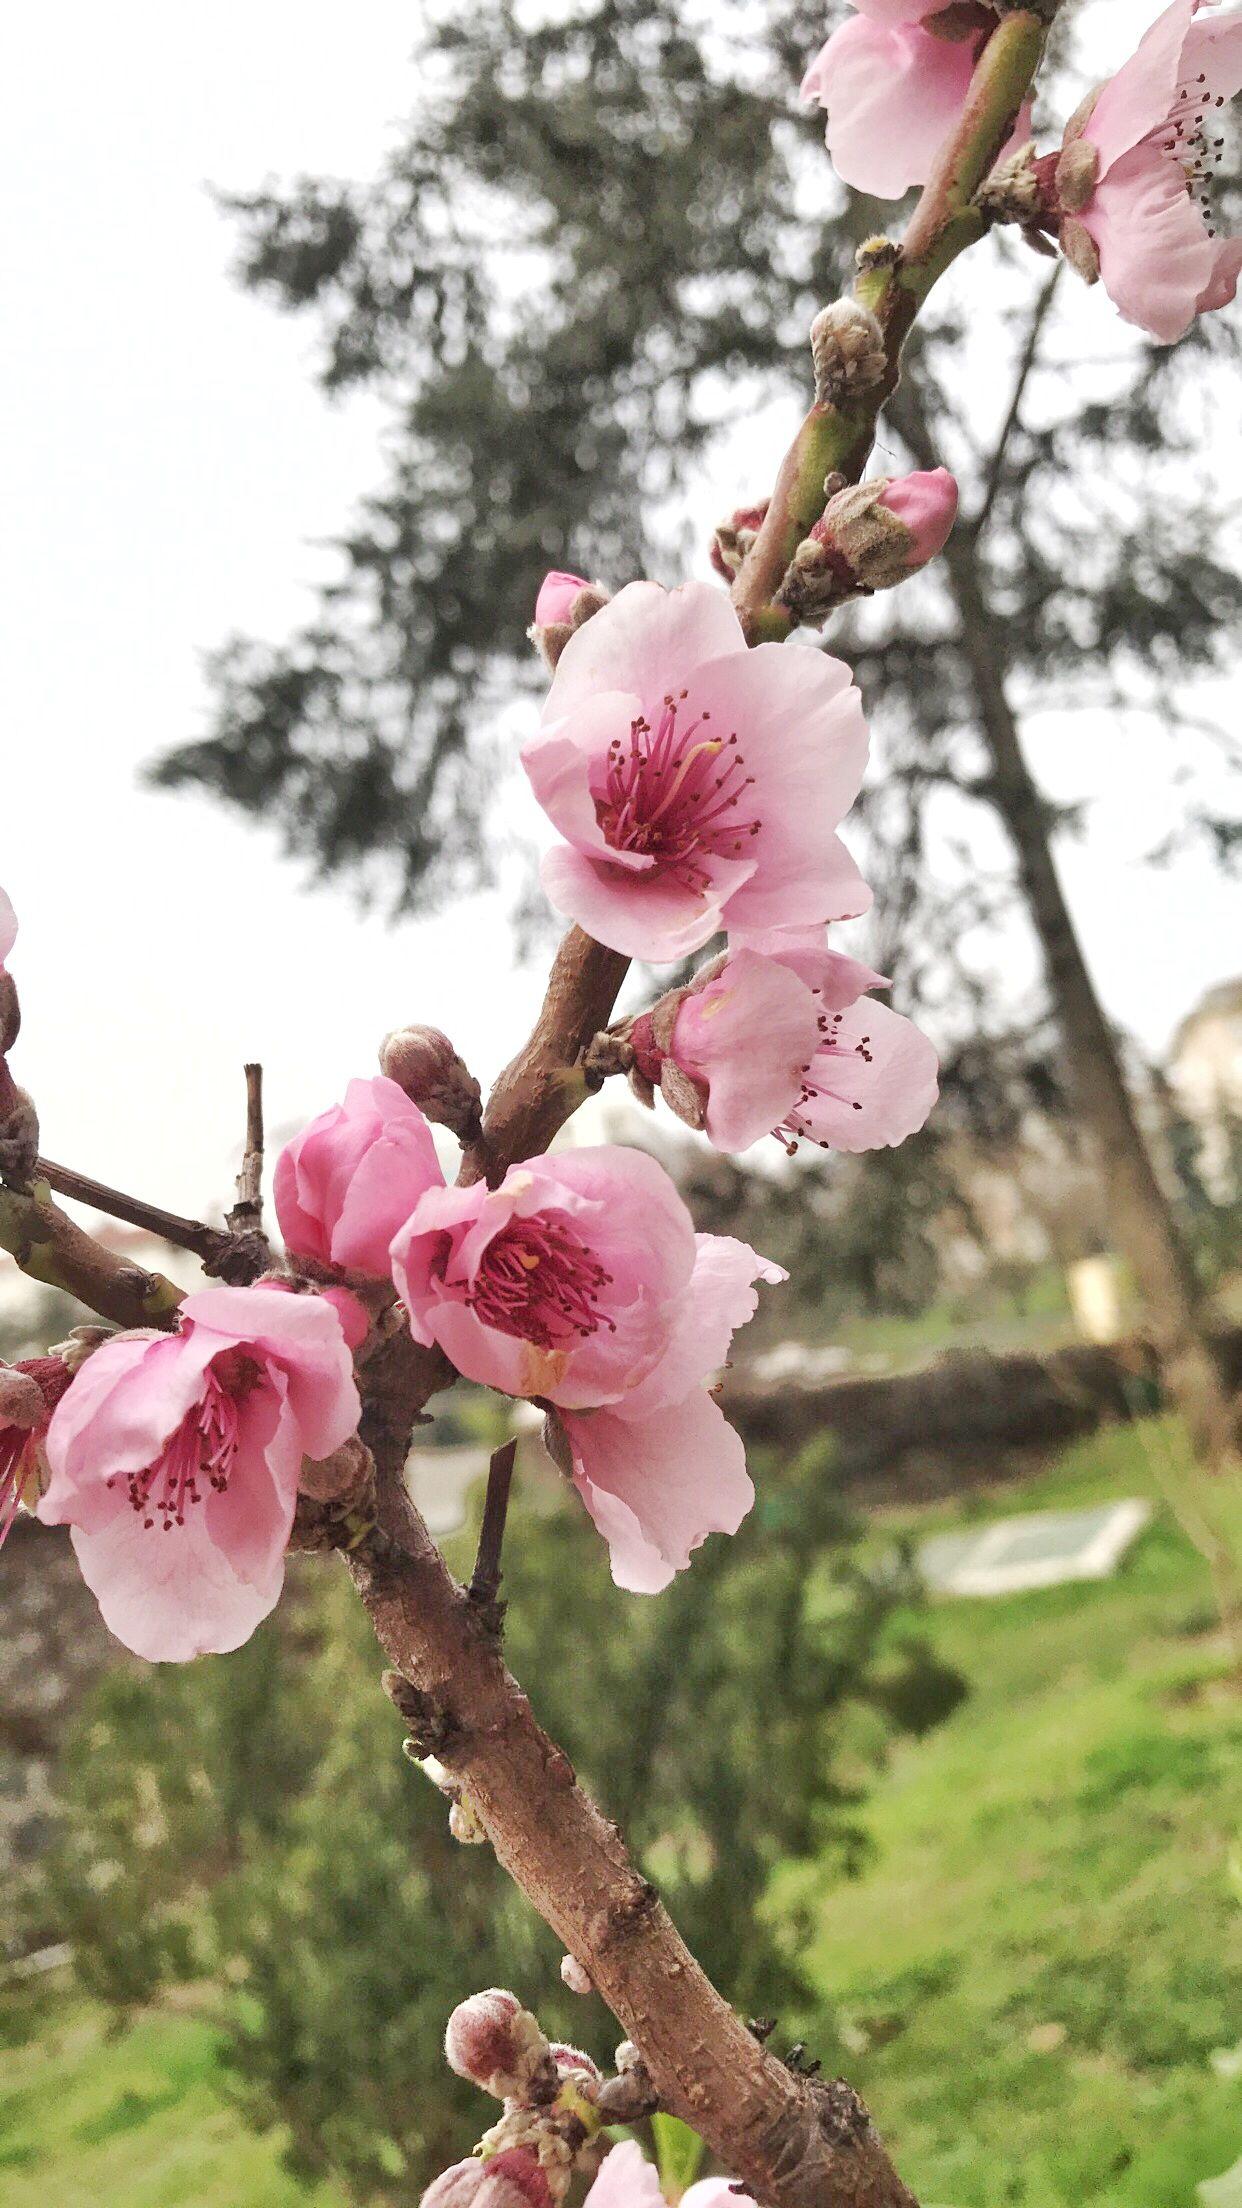 Pin By بثينة الكواري On ورد الربيع Flowers Photography Flowers Rose